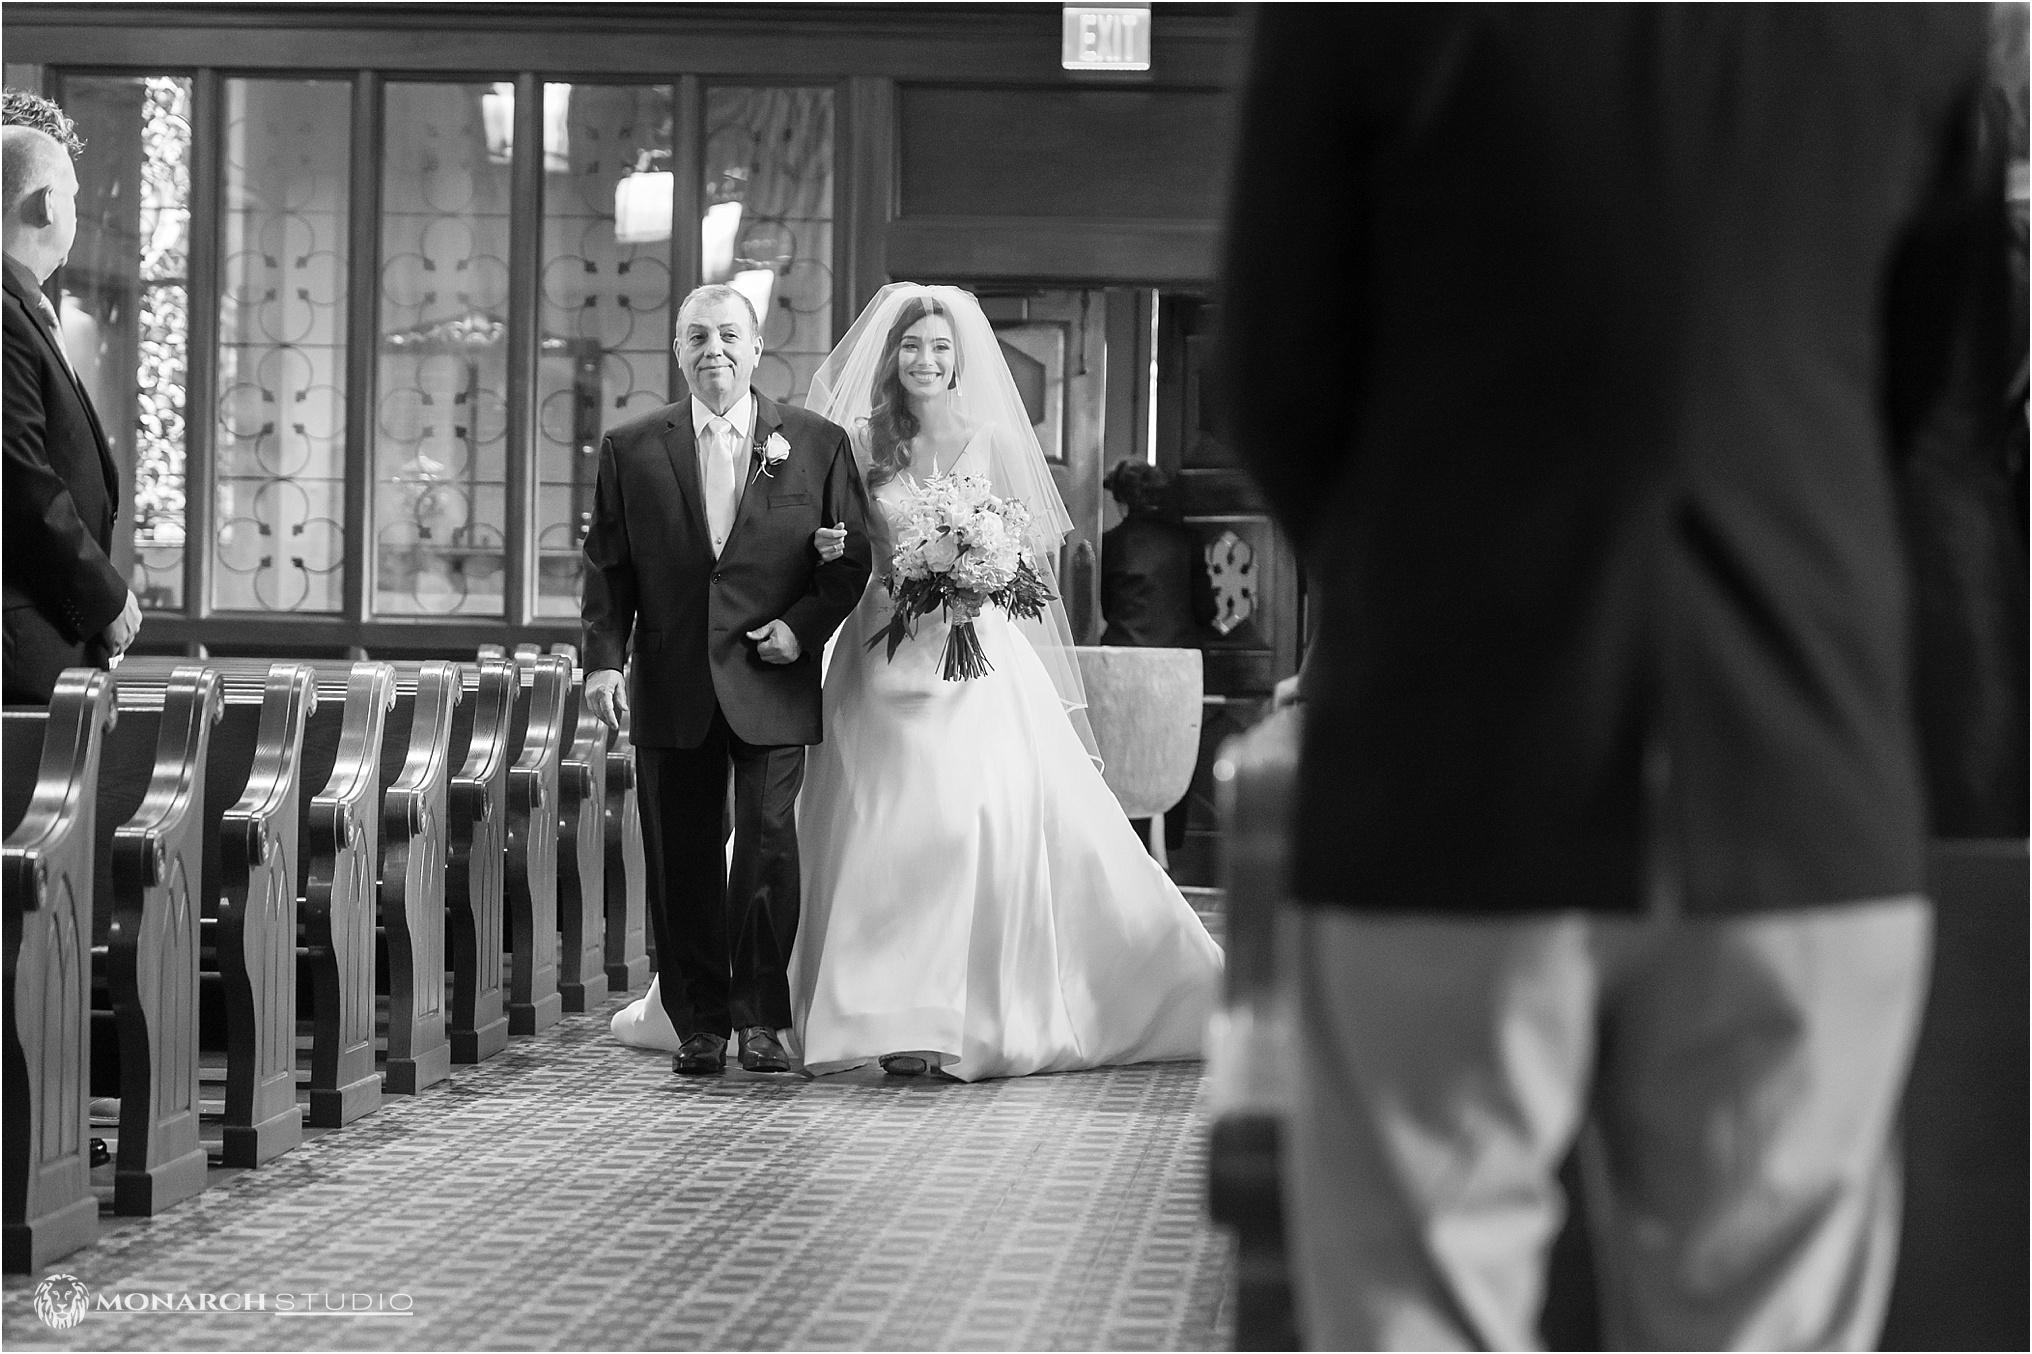 st-augustine-wedding-photographer-046.jpg